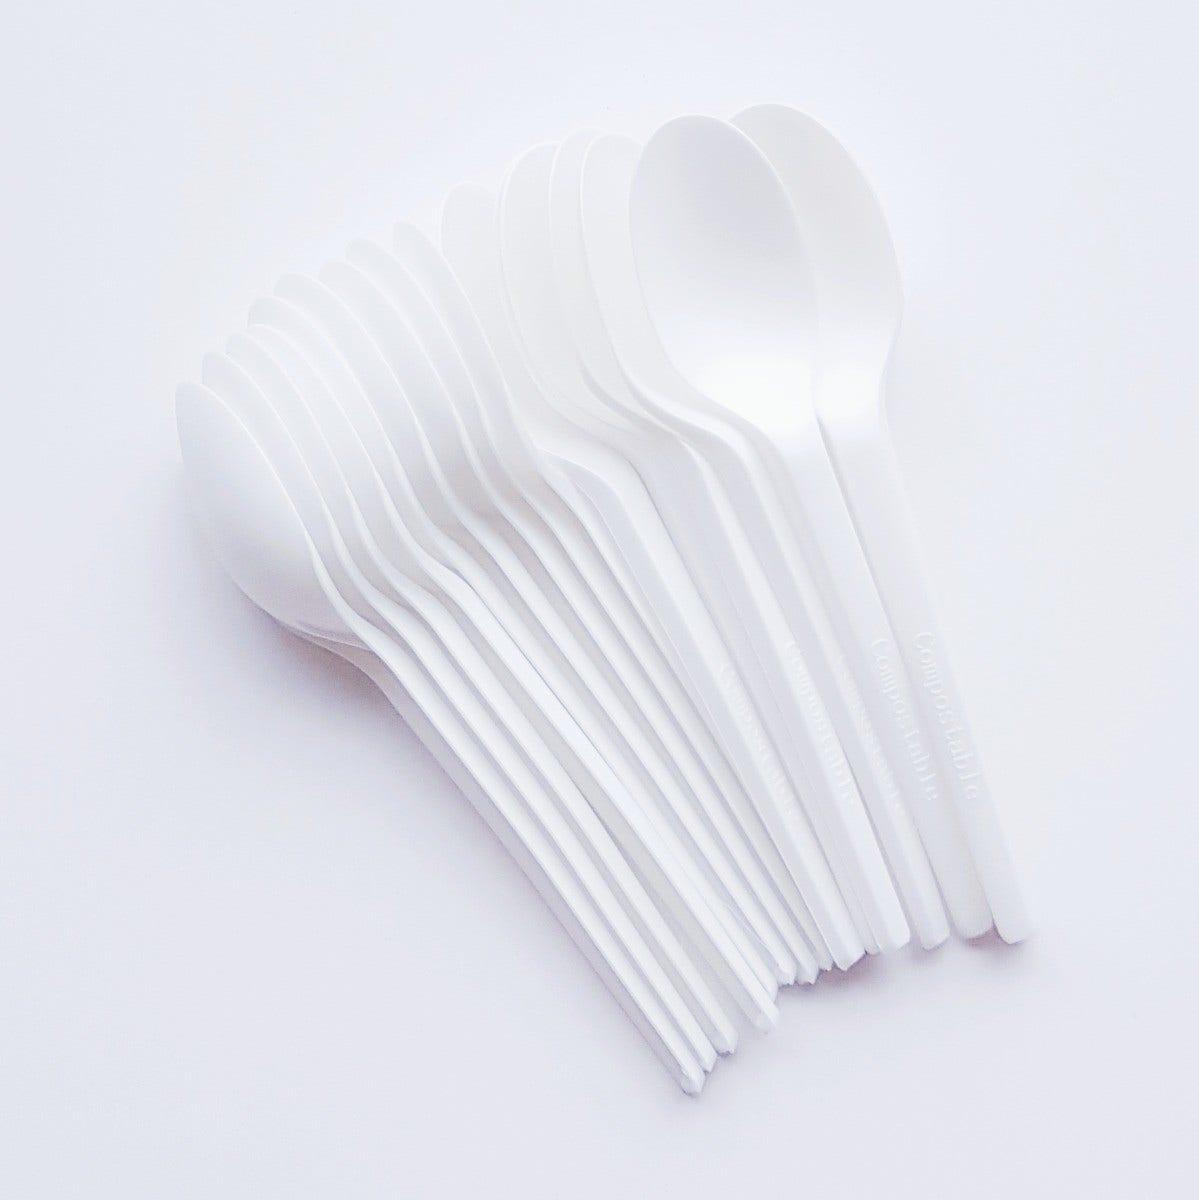 White-Cutlery-NL